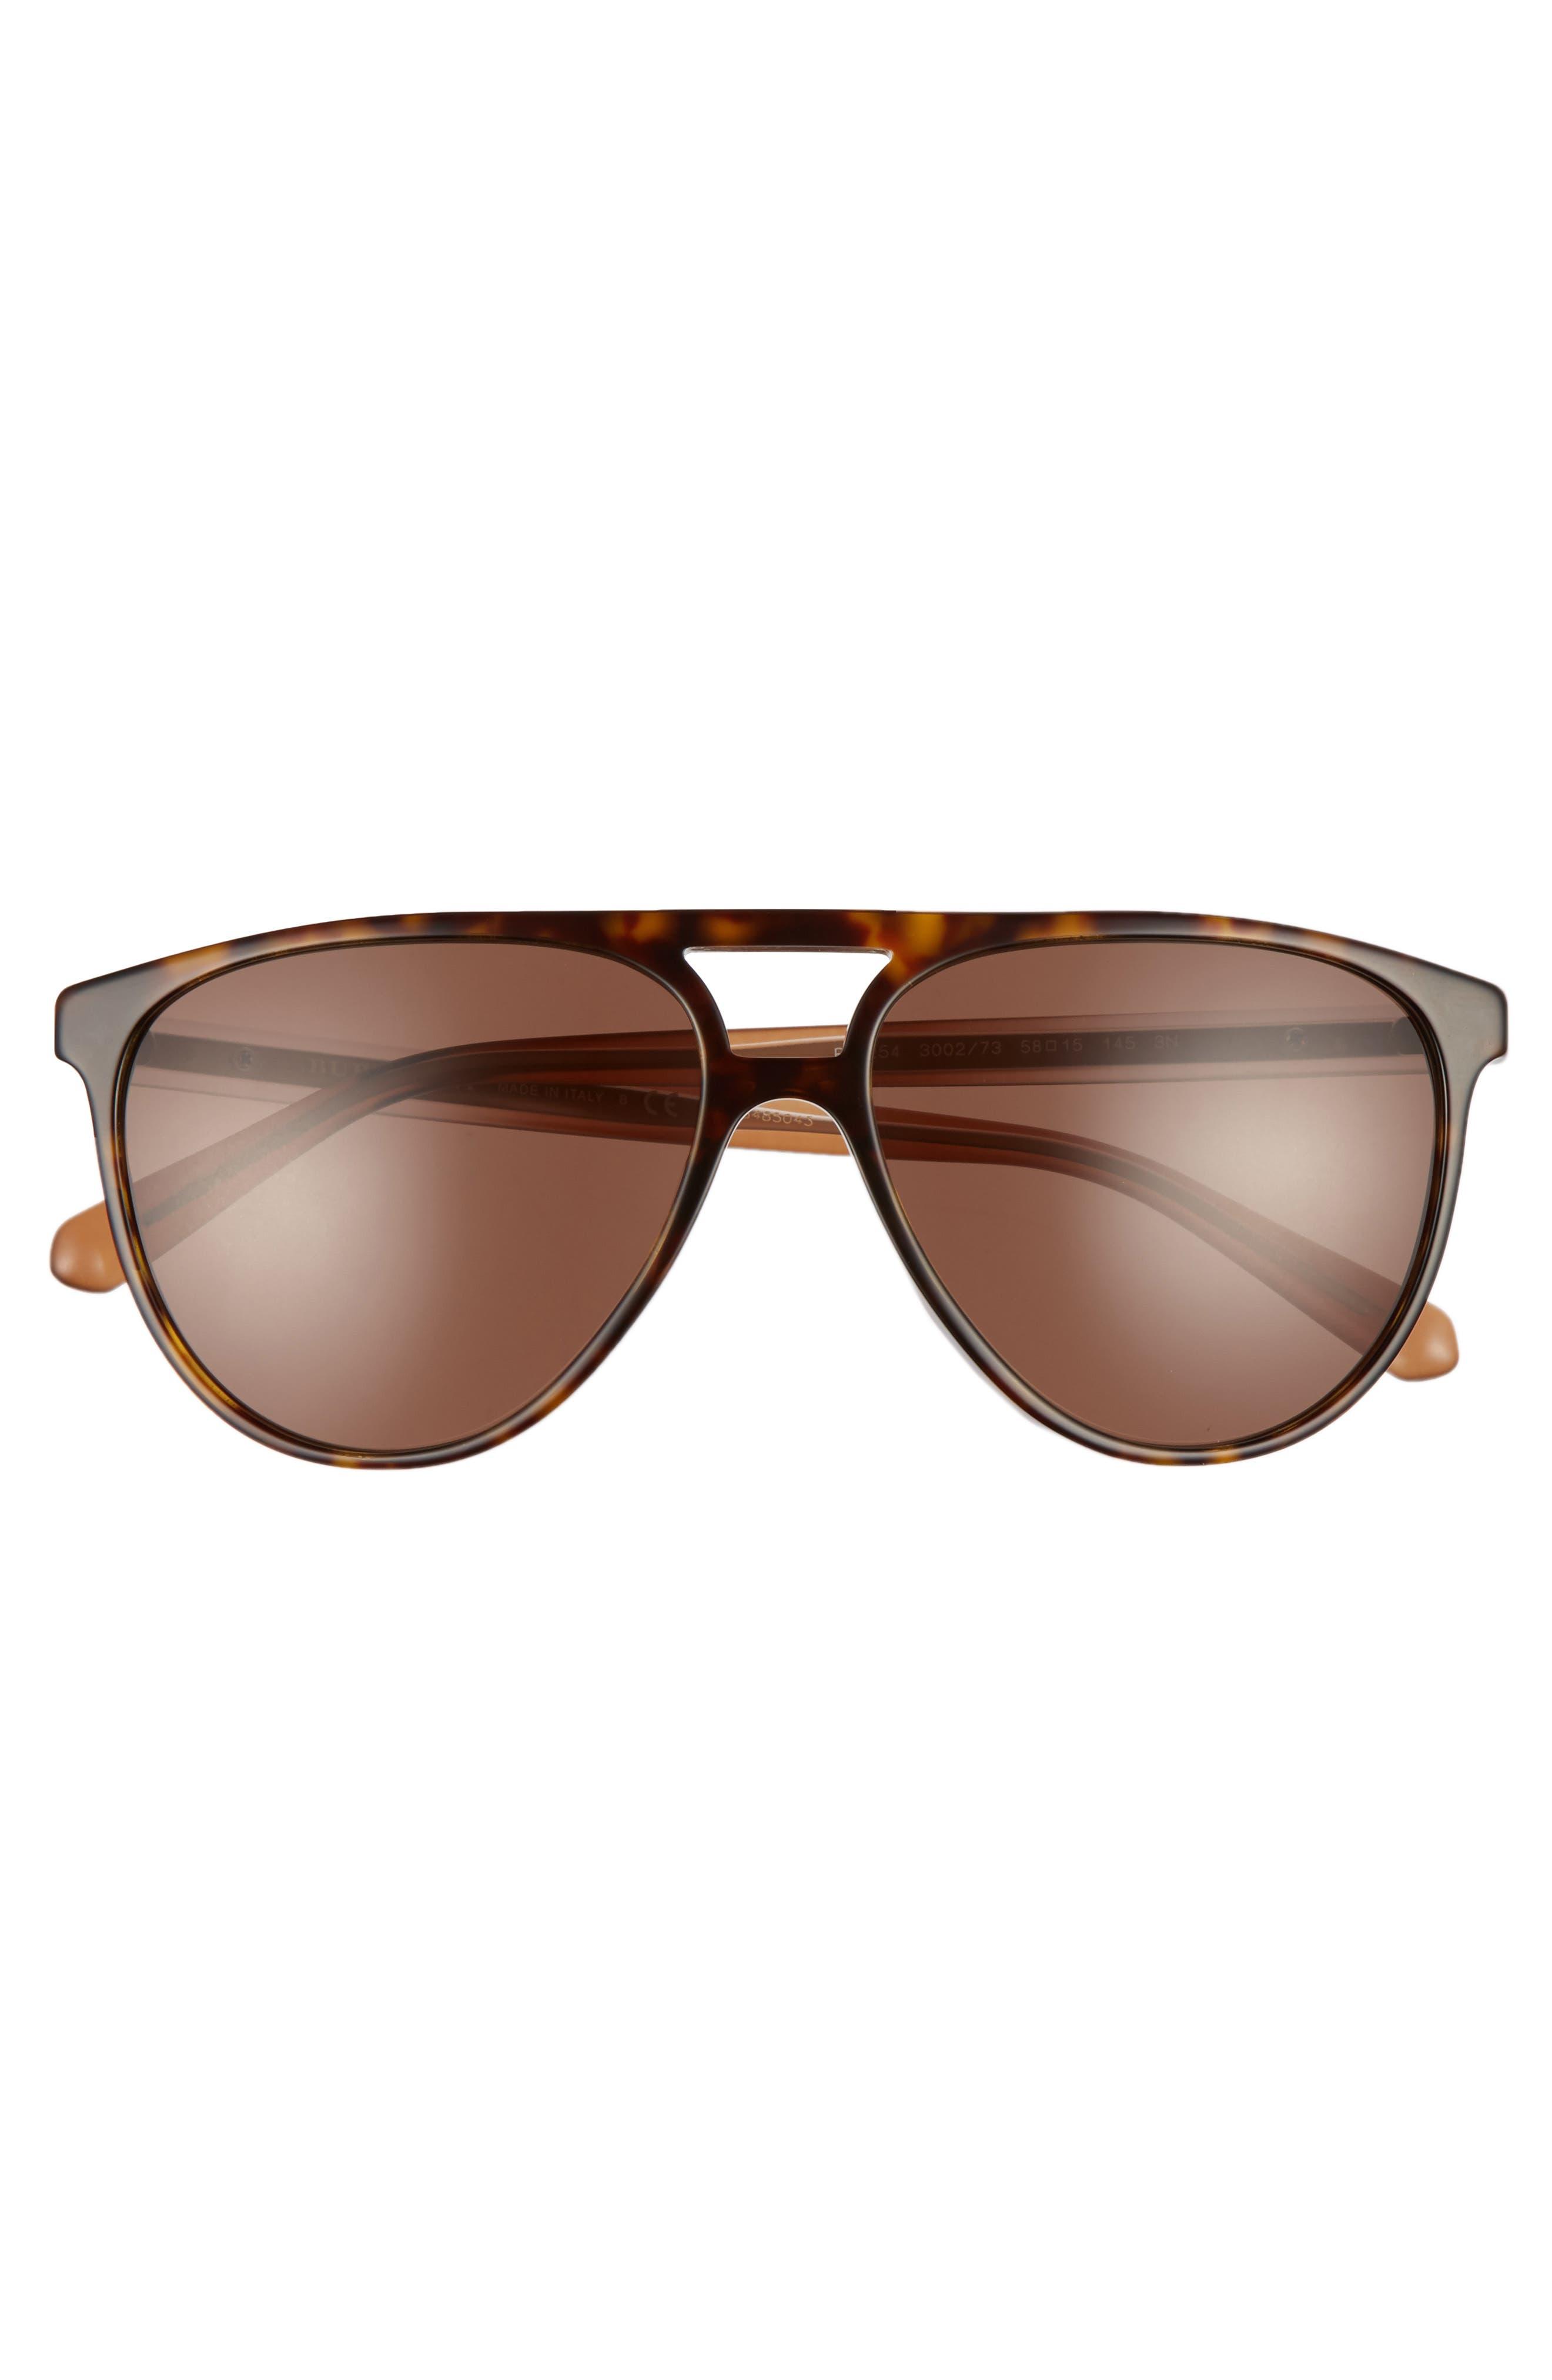 58mm Aviator Sunglasses,                             Alternate thumbnail 3, color,